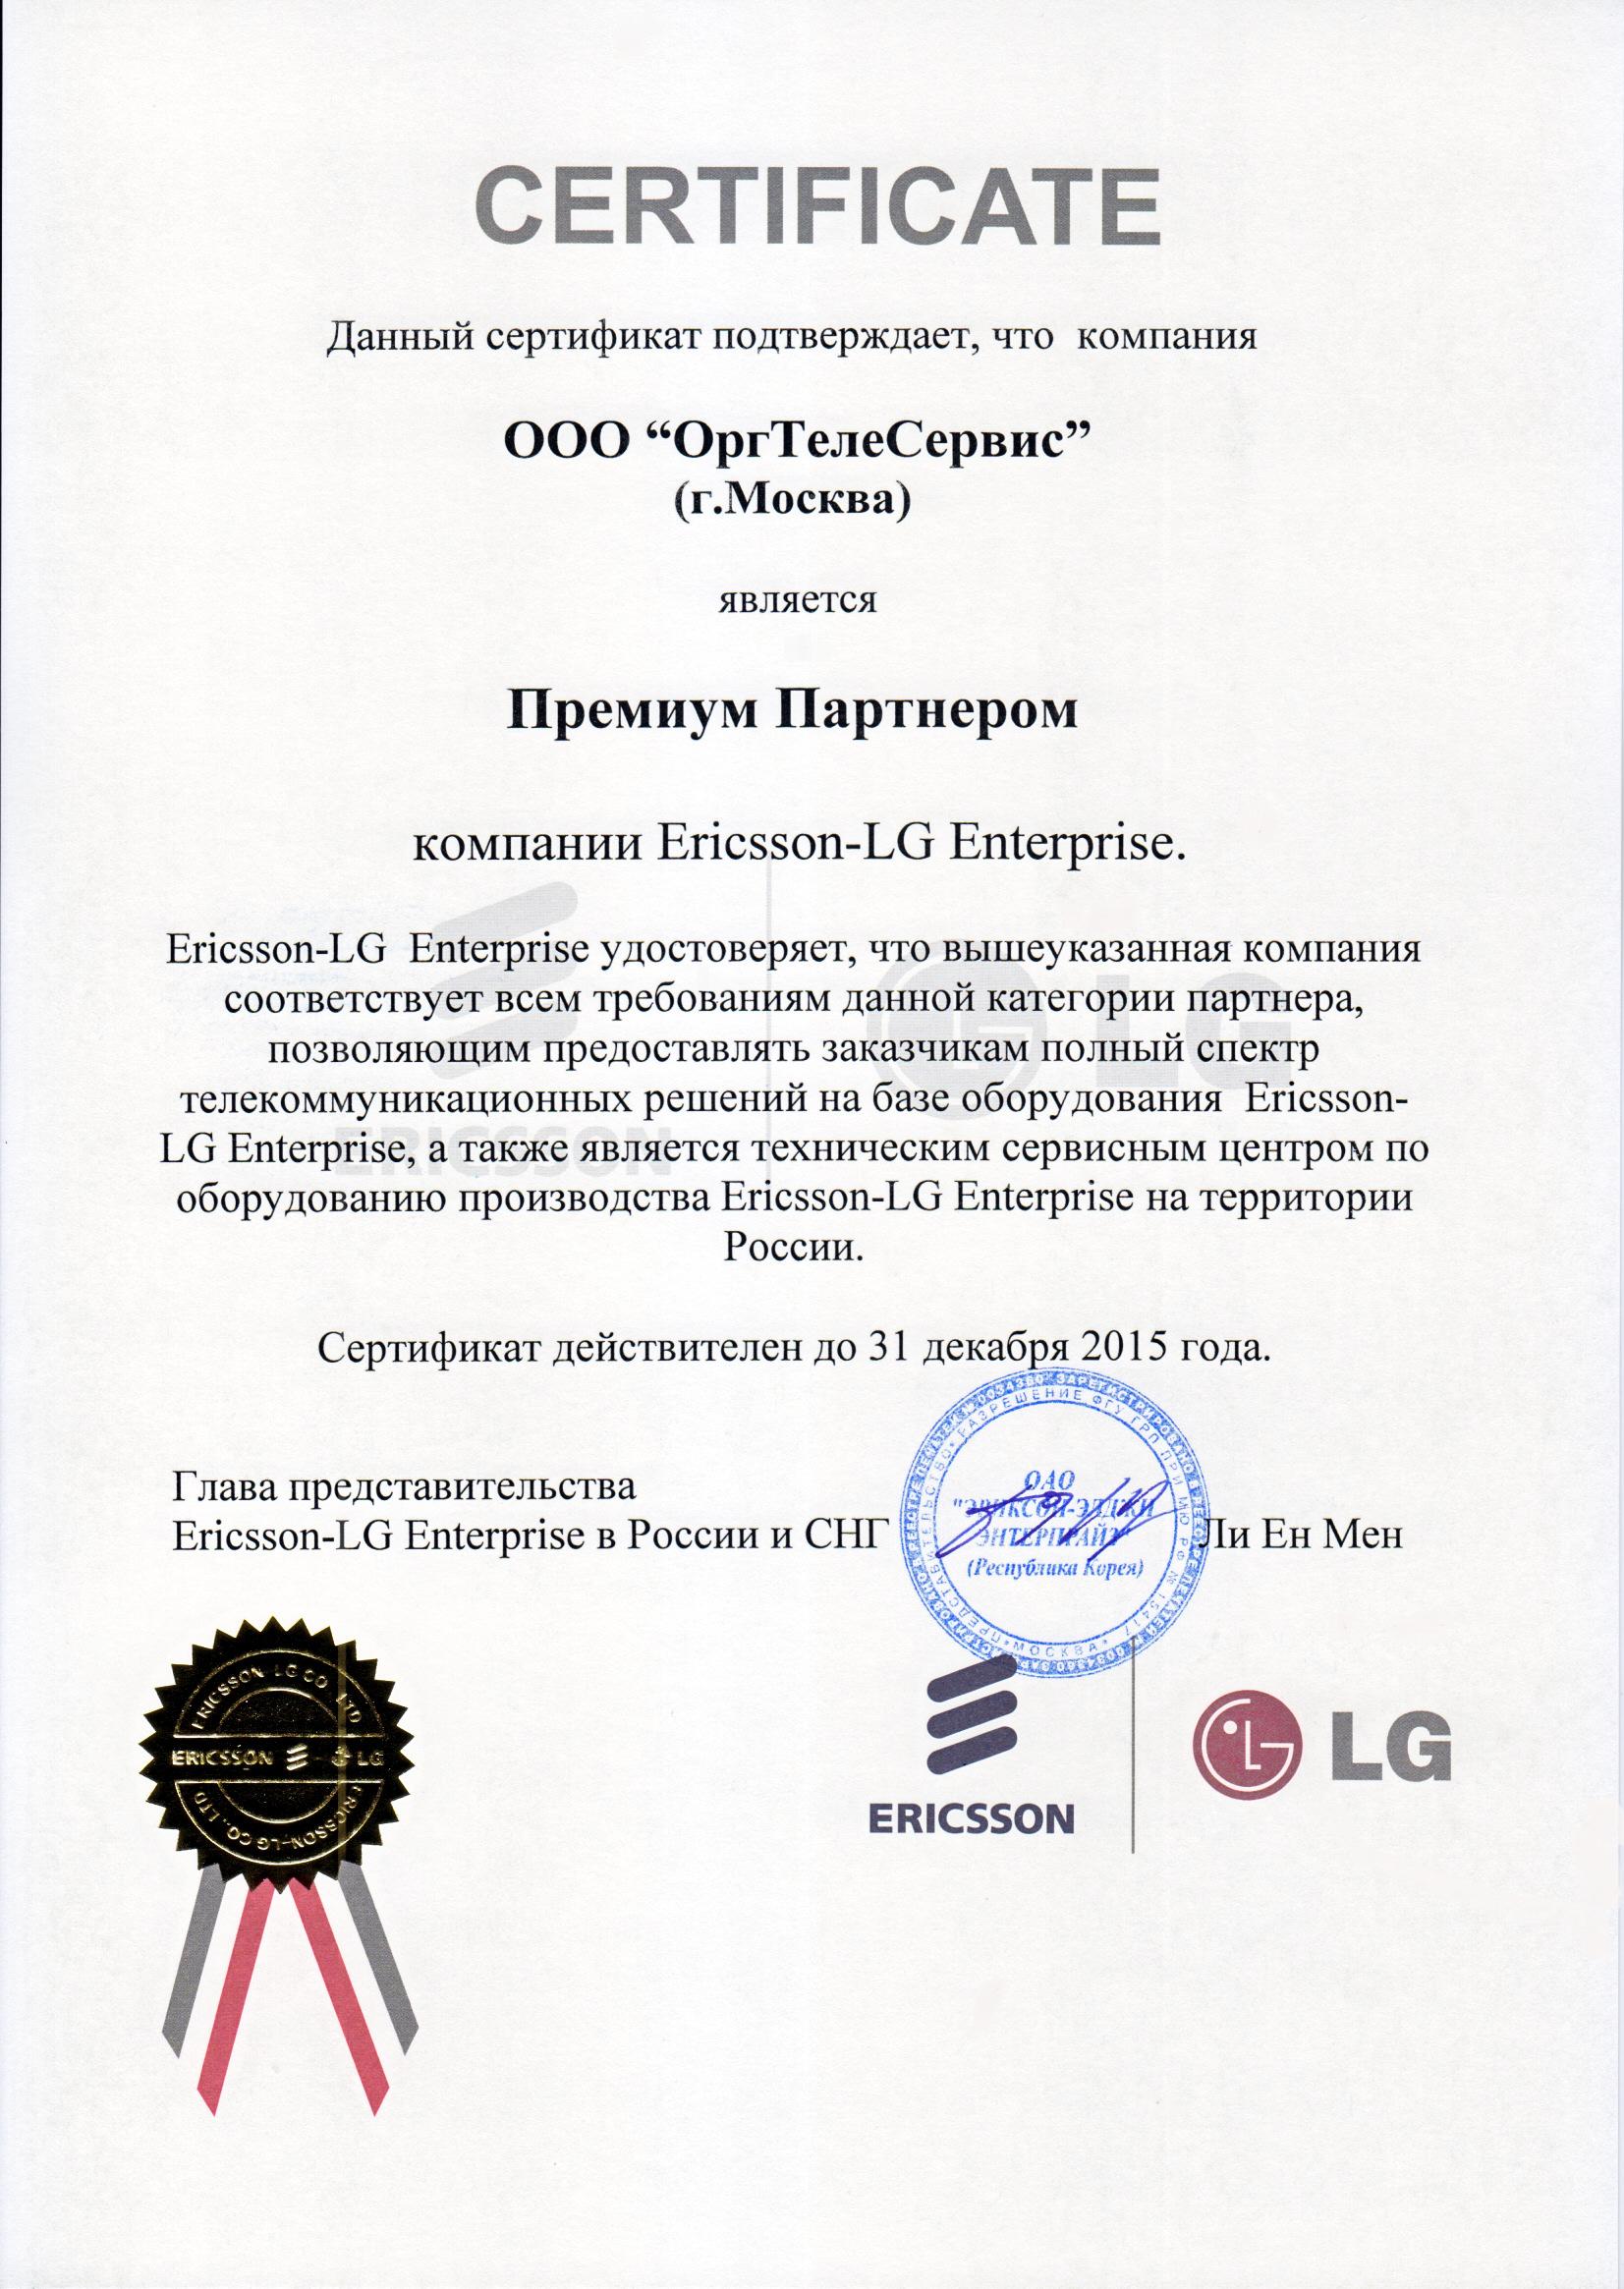 Сертификат Ericsson LG Сертификаты